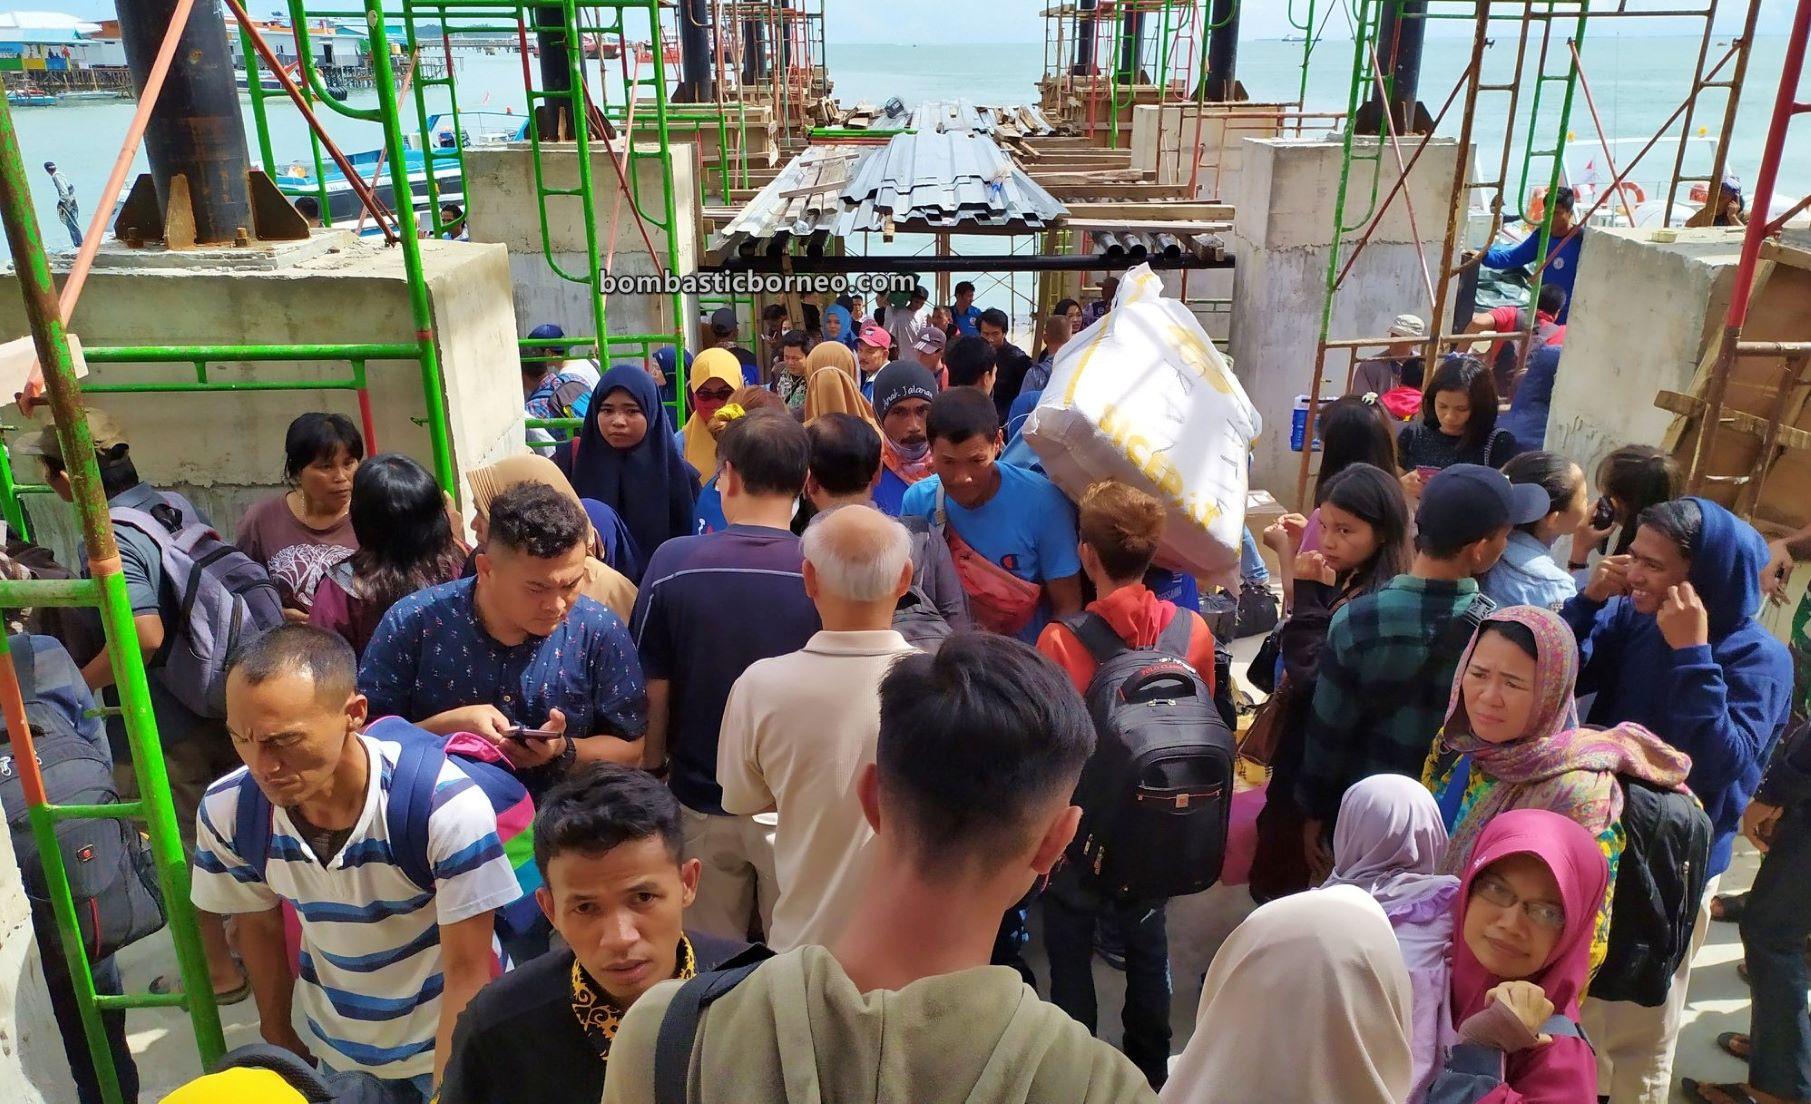 FAM Trip, speedboat, Express Boat ride, adventure, backpackers, destination, exploration, Kalimantan Utara, Pariwisata, Tourism, Trans Border, Borneo, 穿越婆罗洲游踪, 印尼北加里曼丹, 打拉根轮渡码头